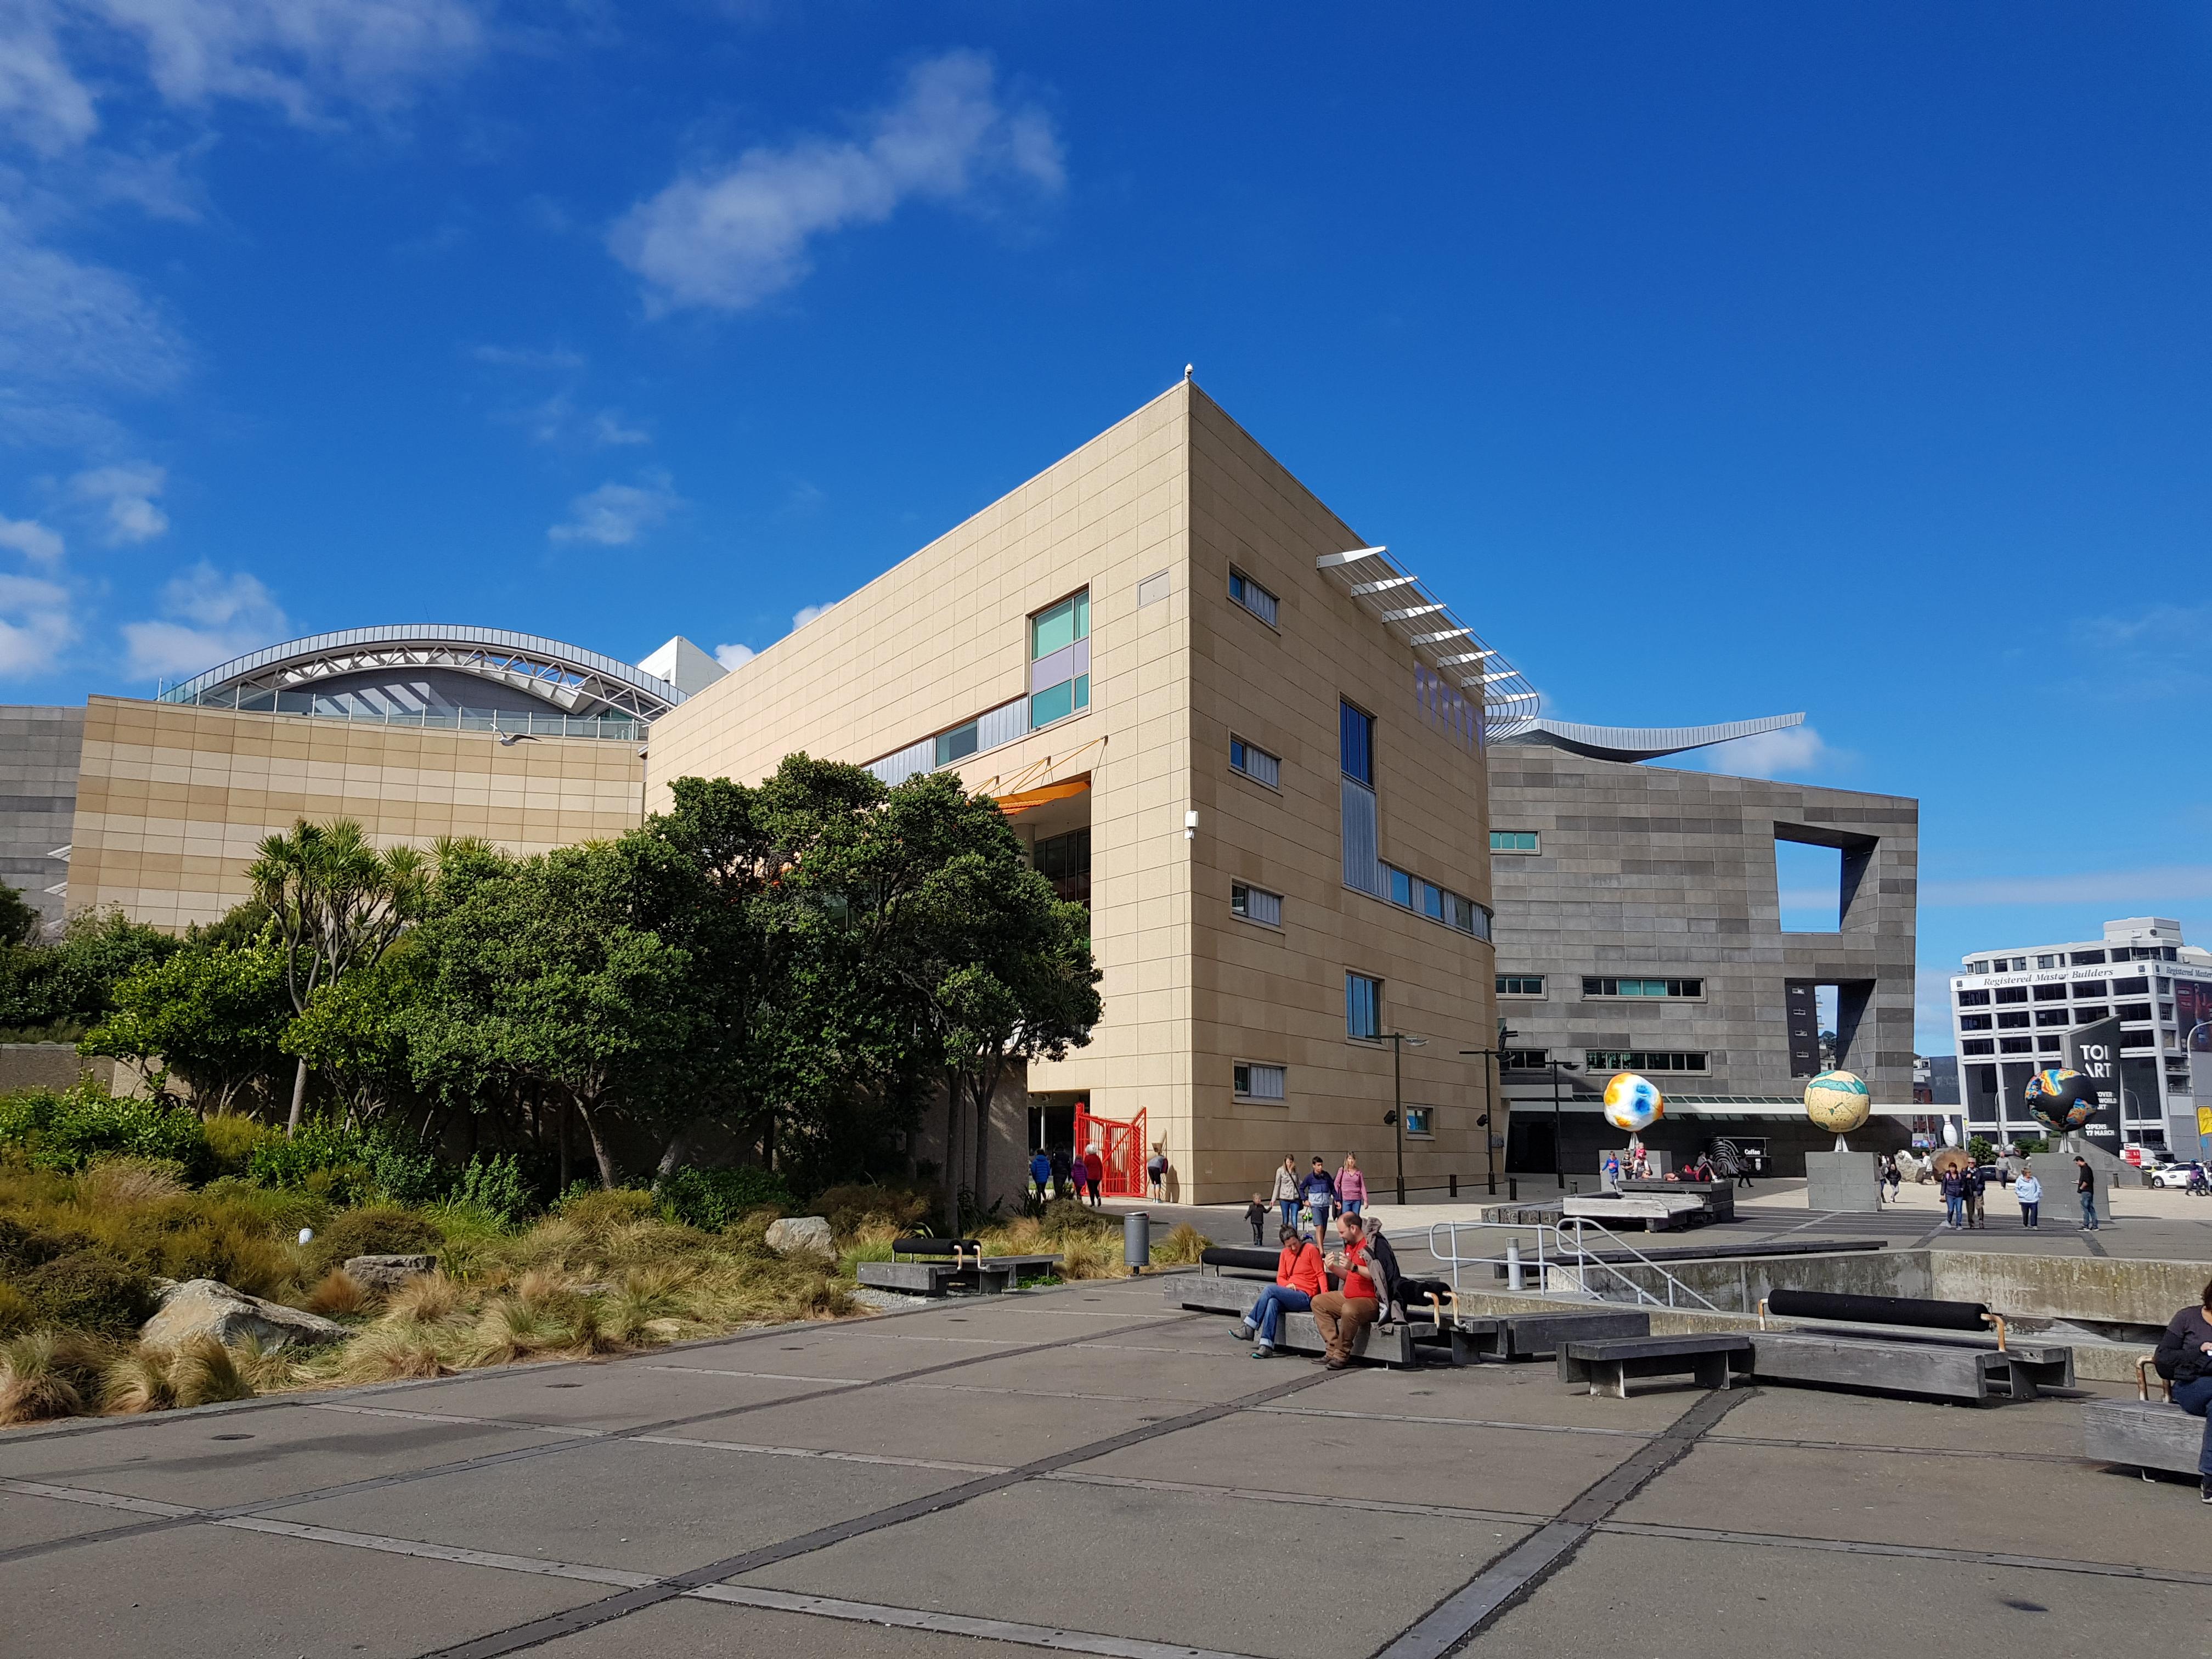 Museum of New Zealand Te Papa Tongarewa